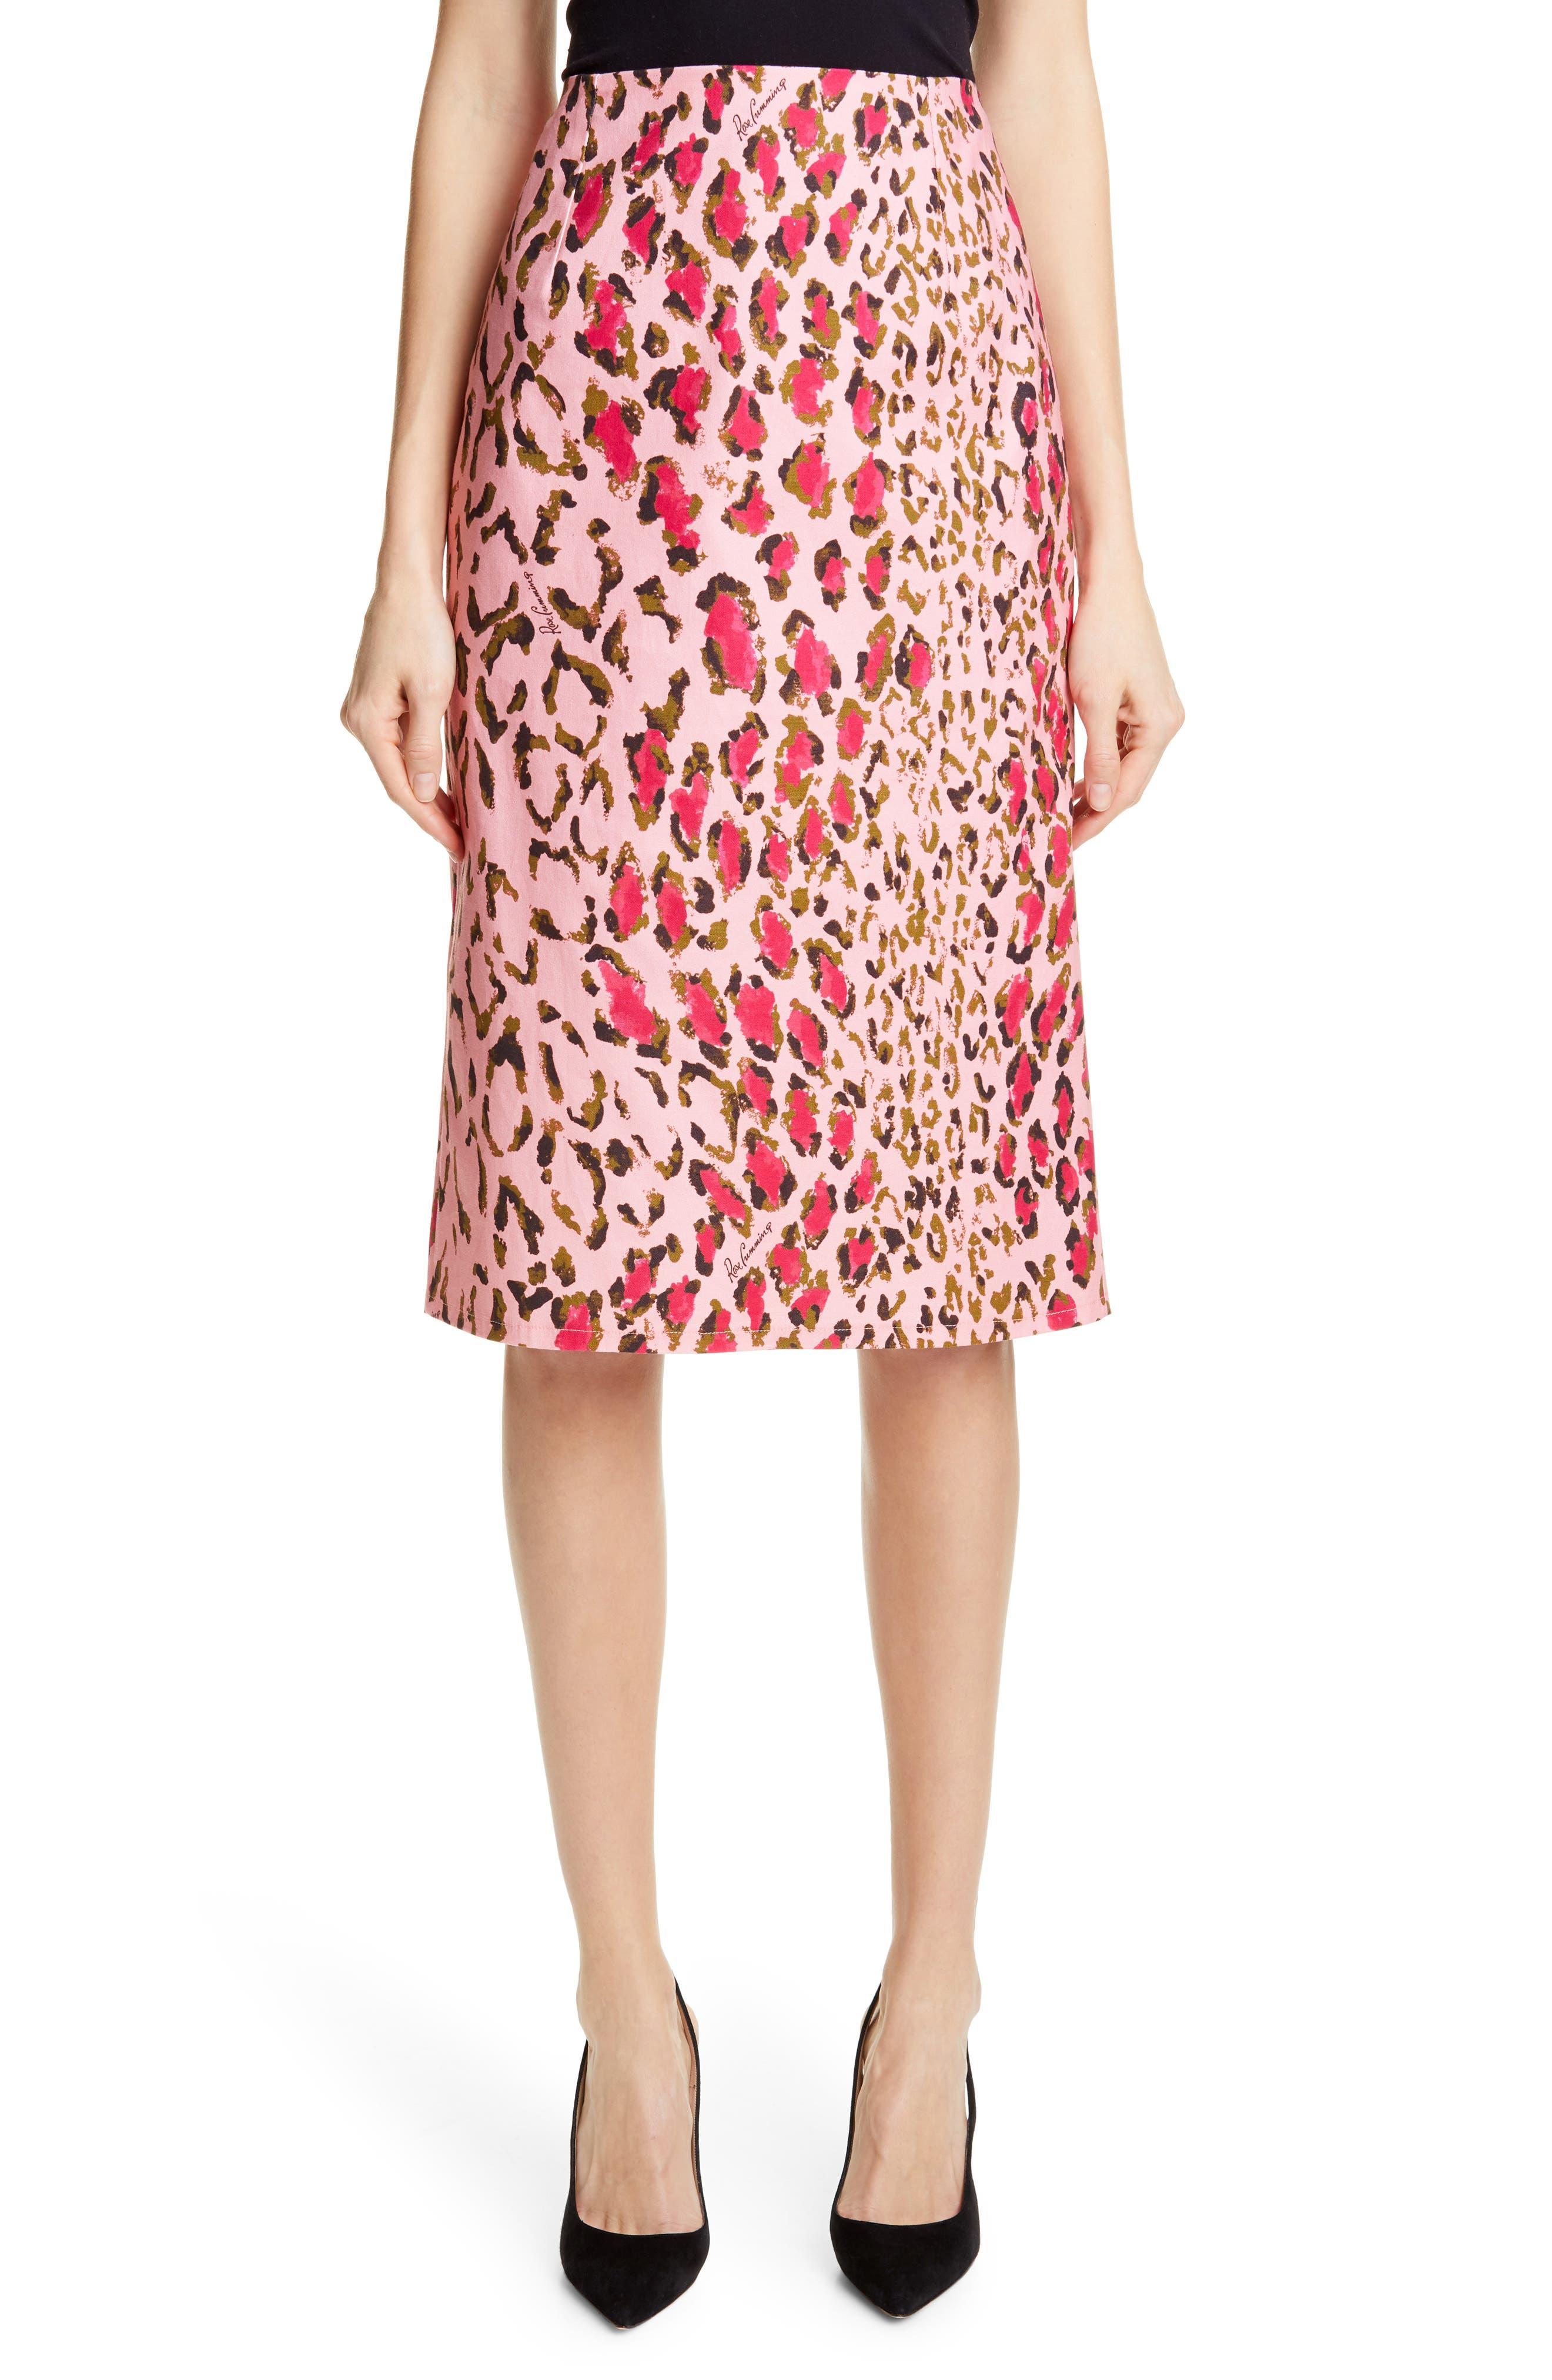 Carolina Herrera Leopard Print Pencil Skirt | Nordstrom